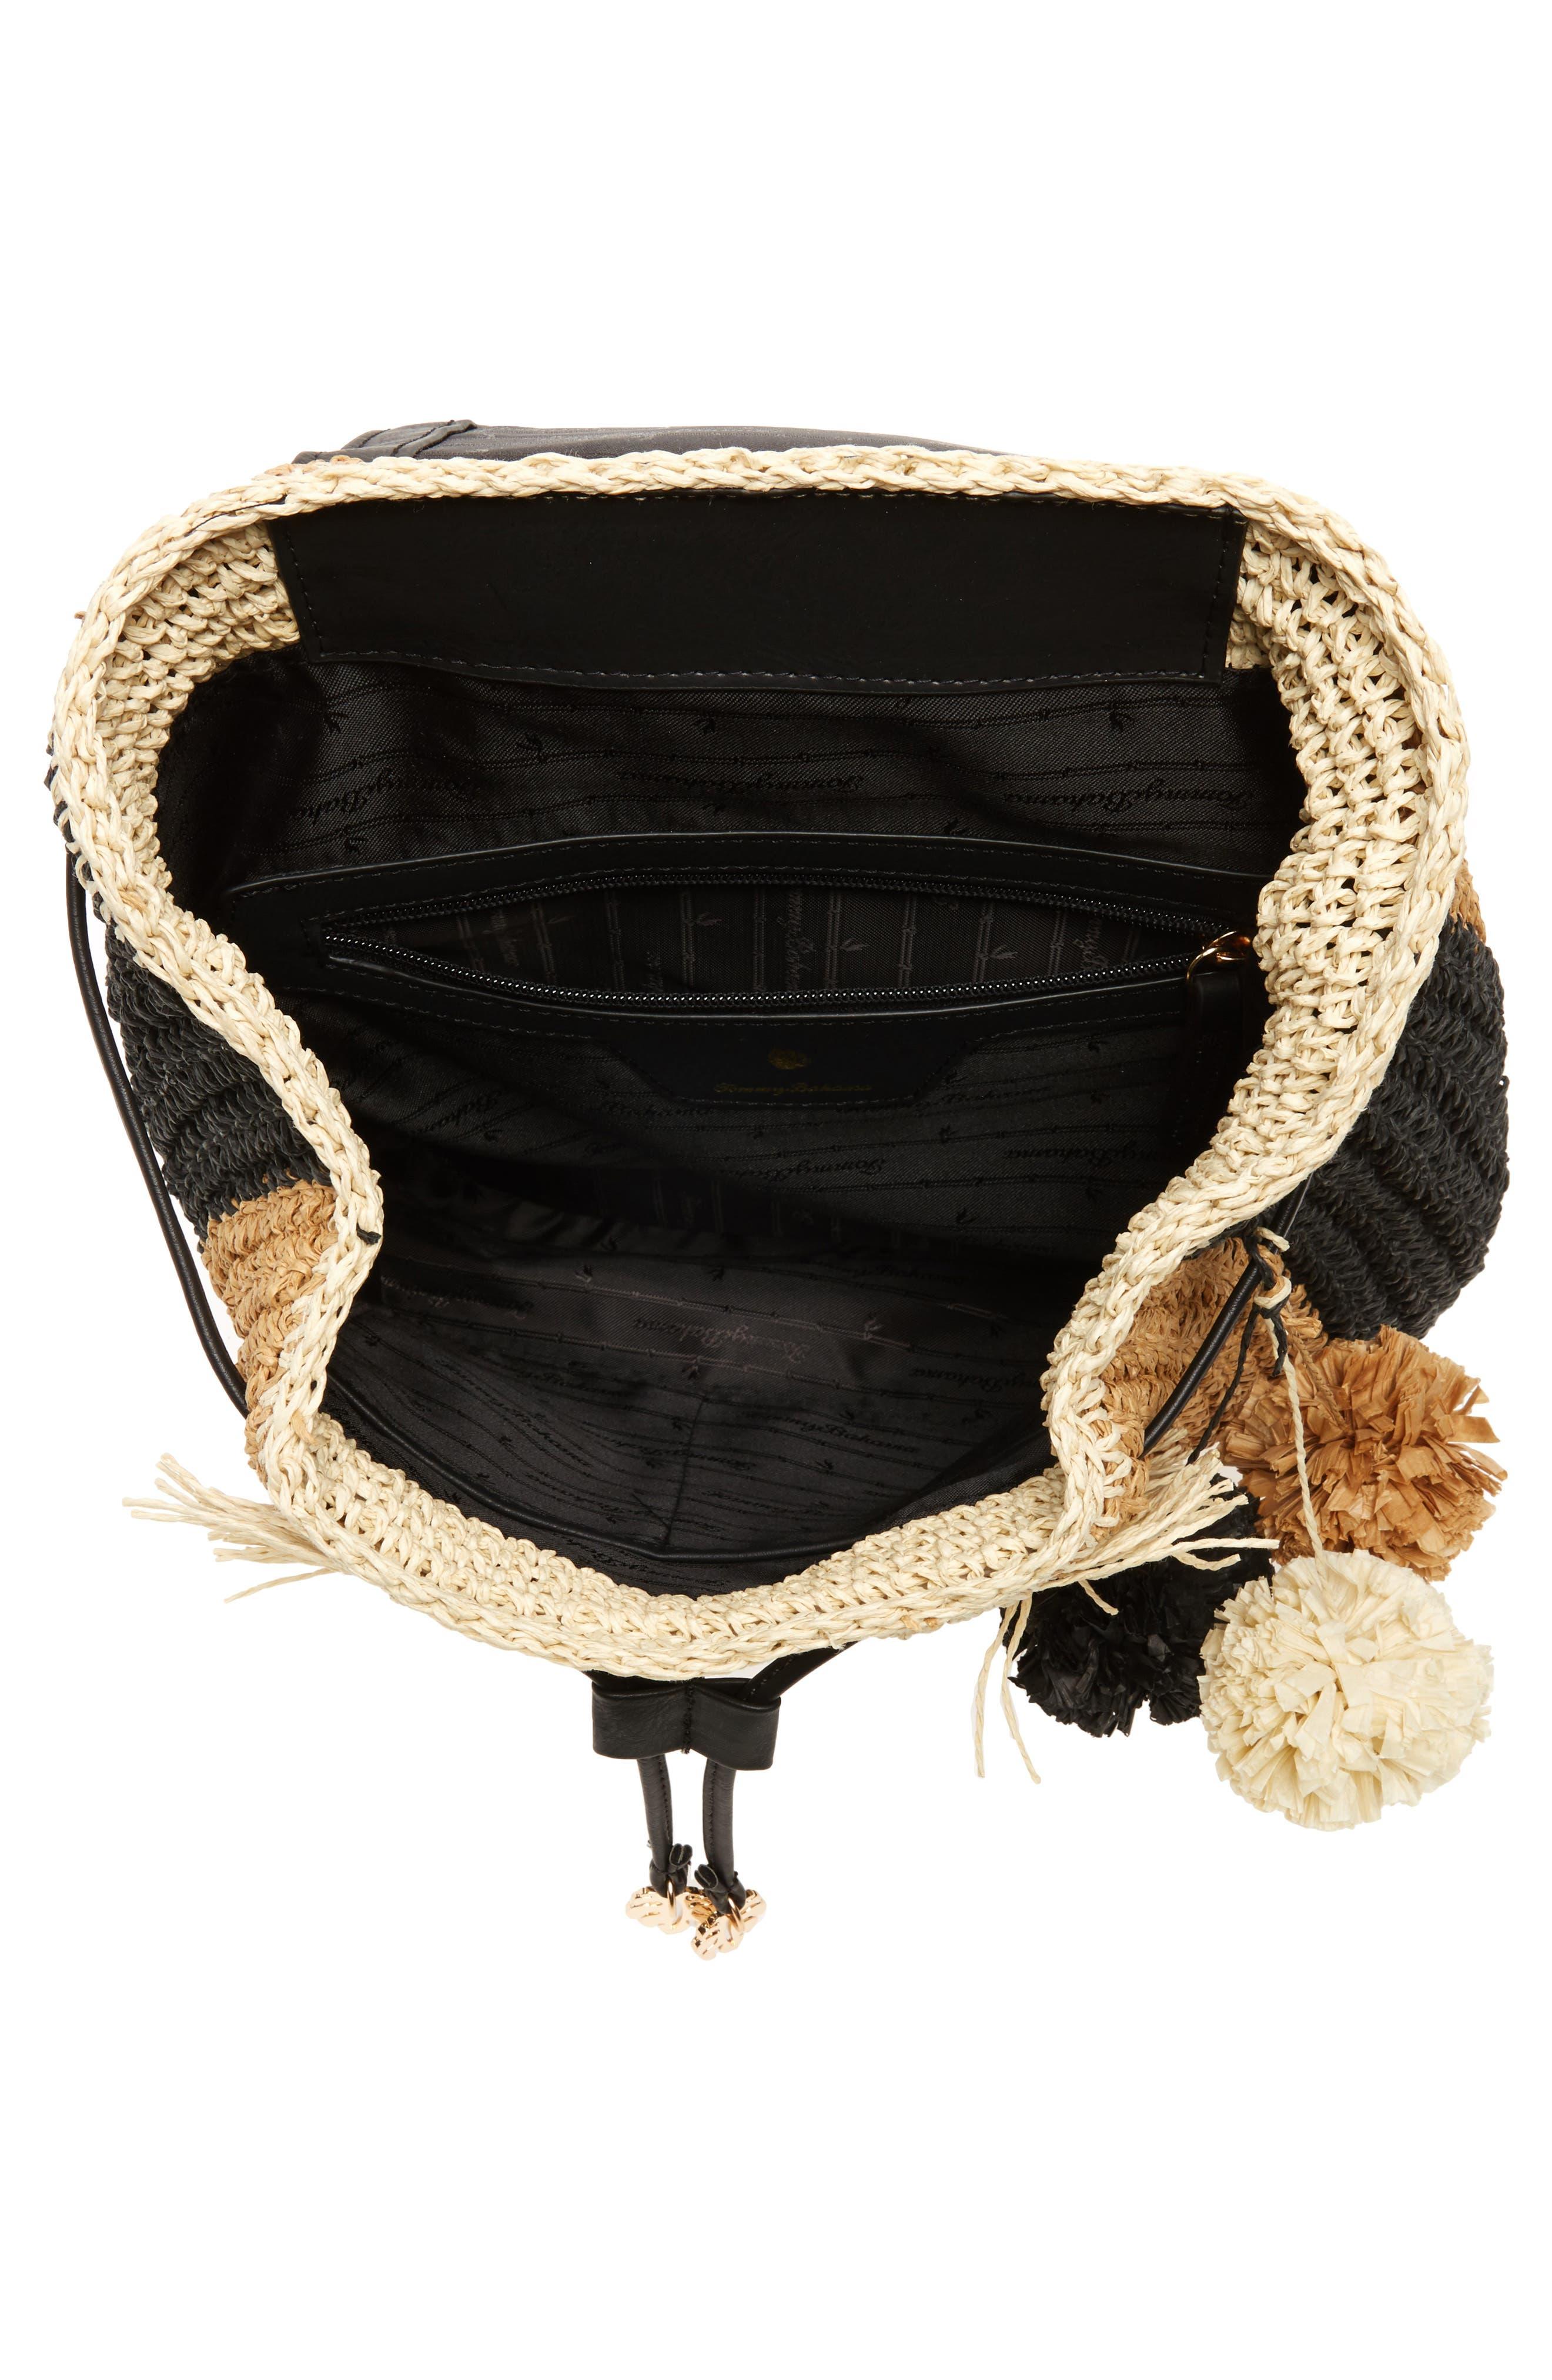 Bahama Mama Straw Backpack,                             Alternate thumbnail 4, color,                             001